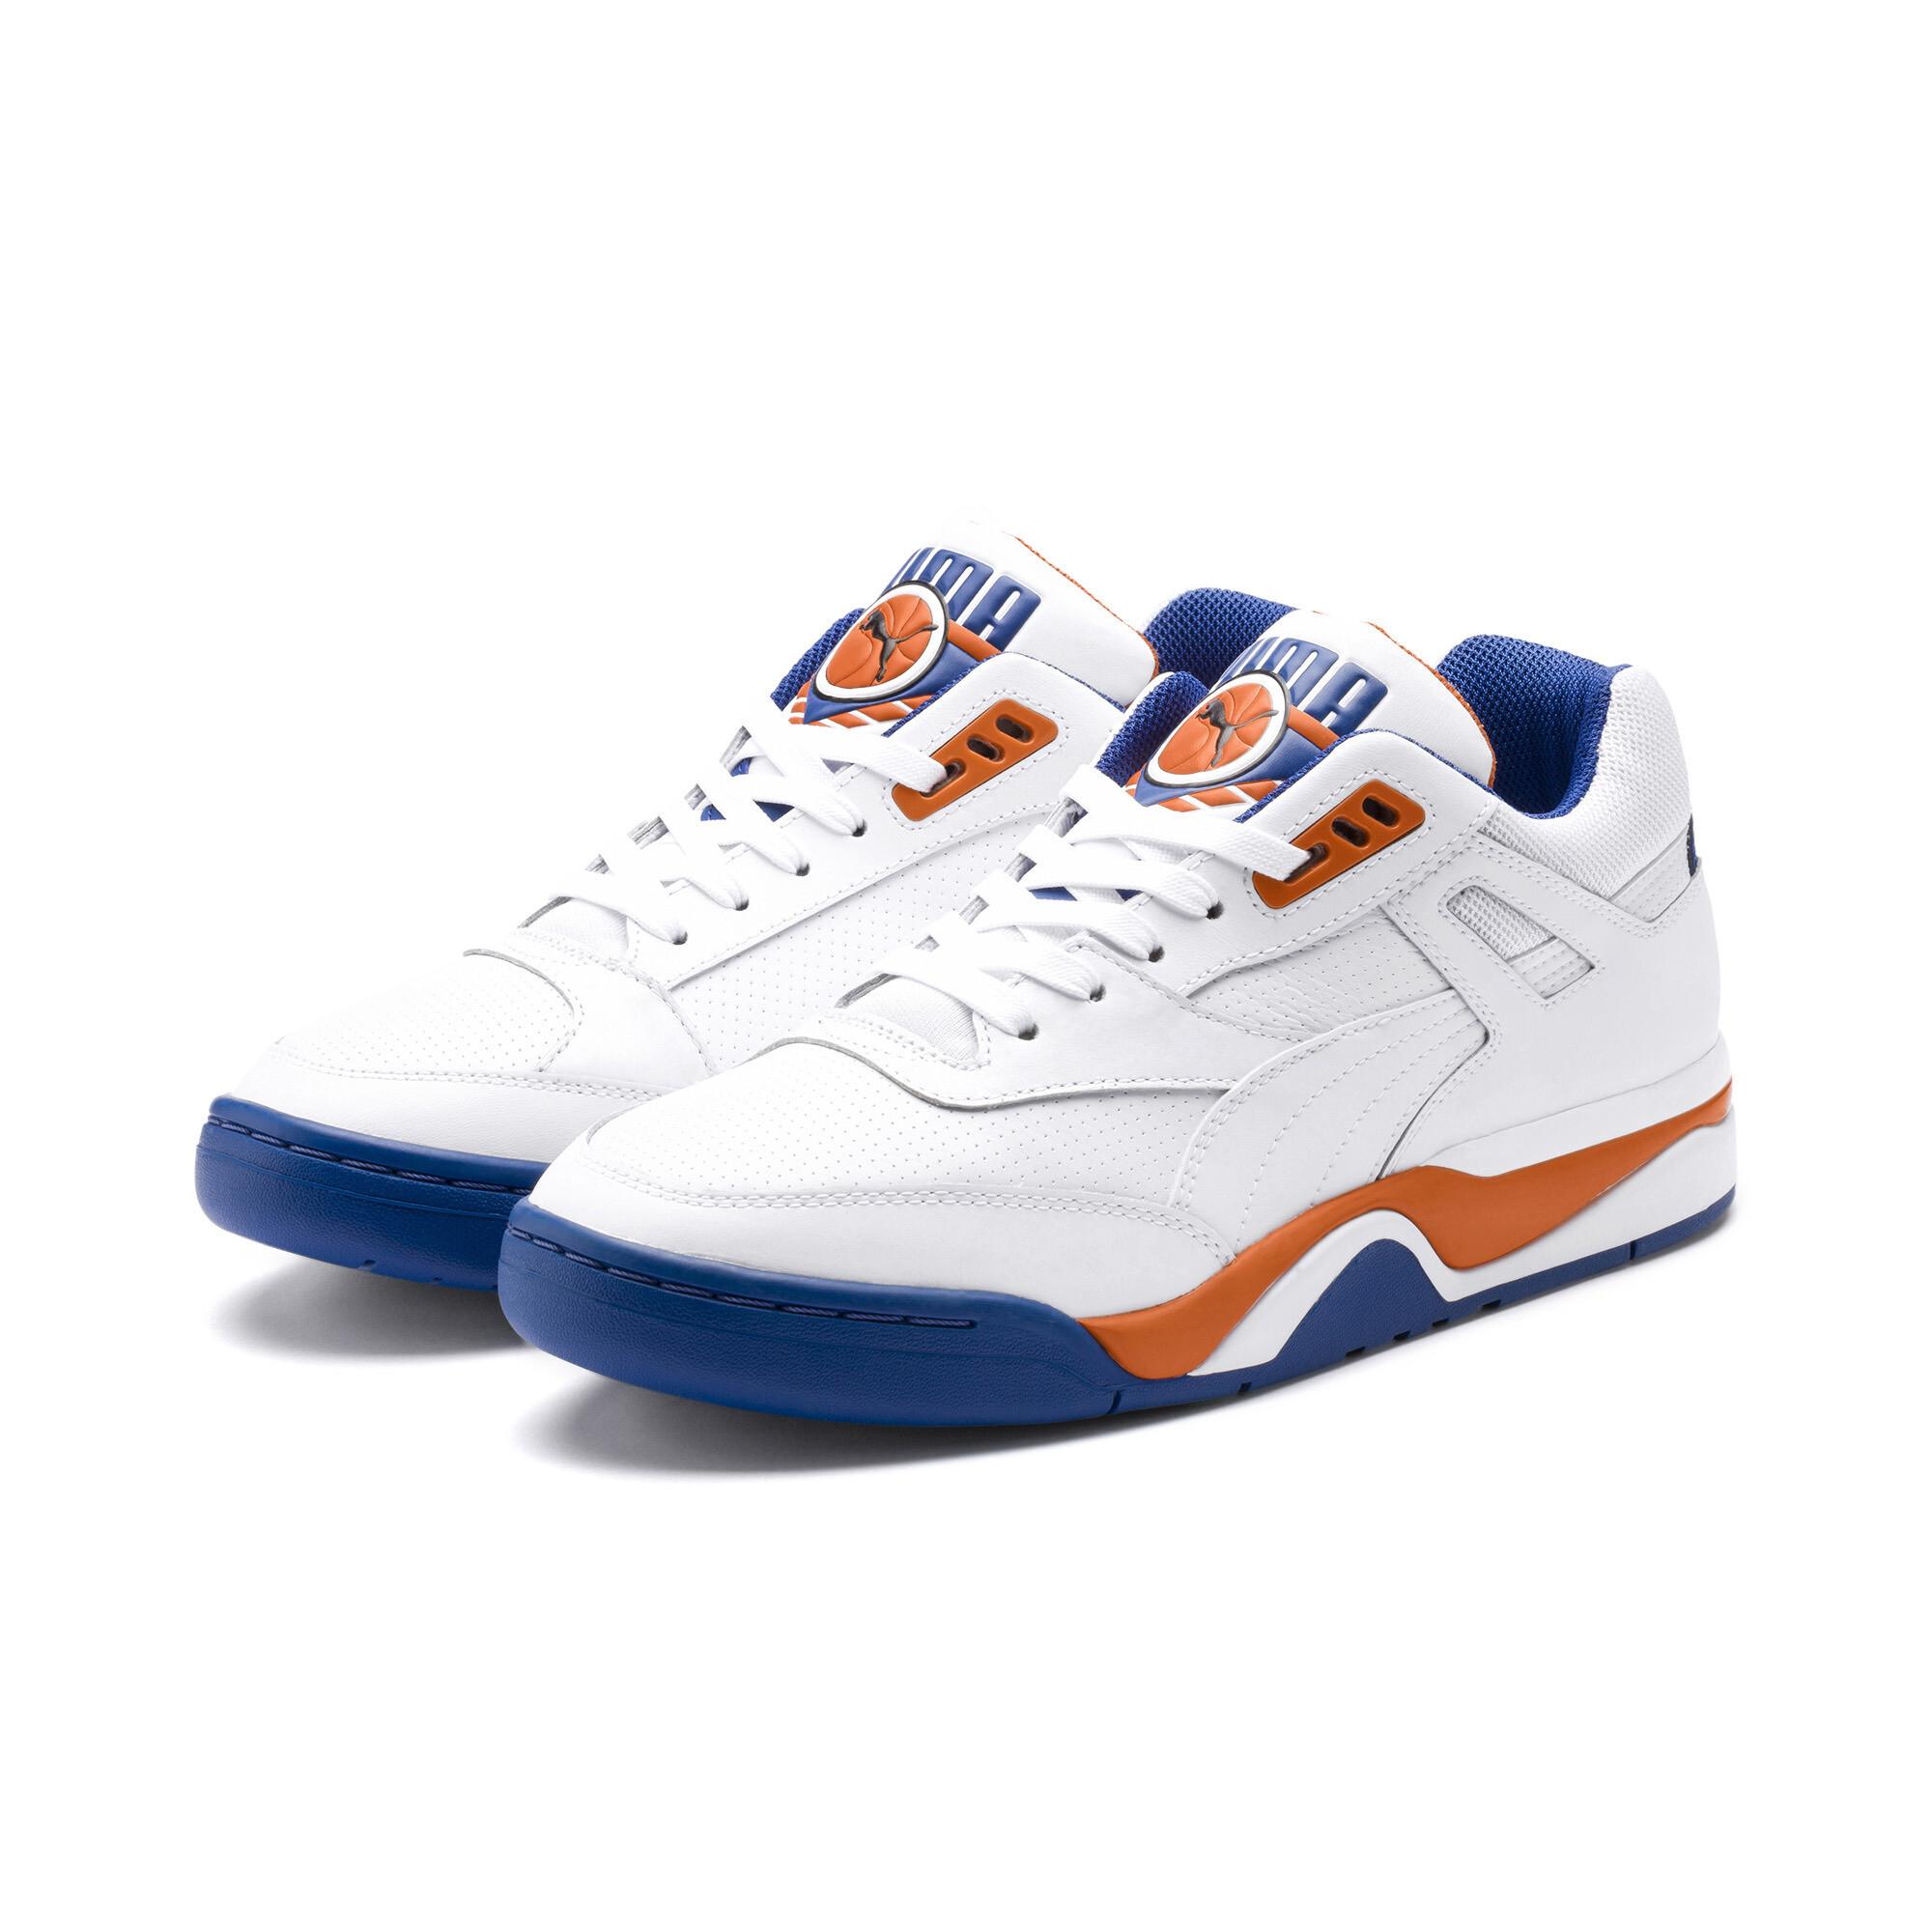 Indexbild 29 - PUMA Palace Guard Sneaker Unisex Schuhe Sport Classics Neu